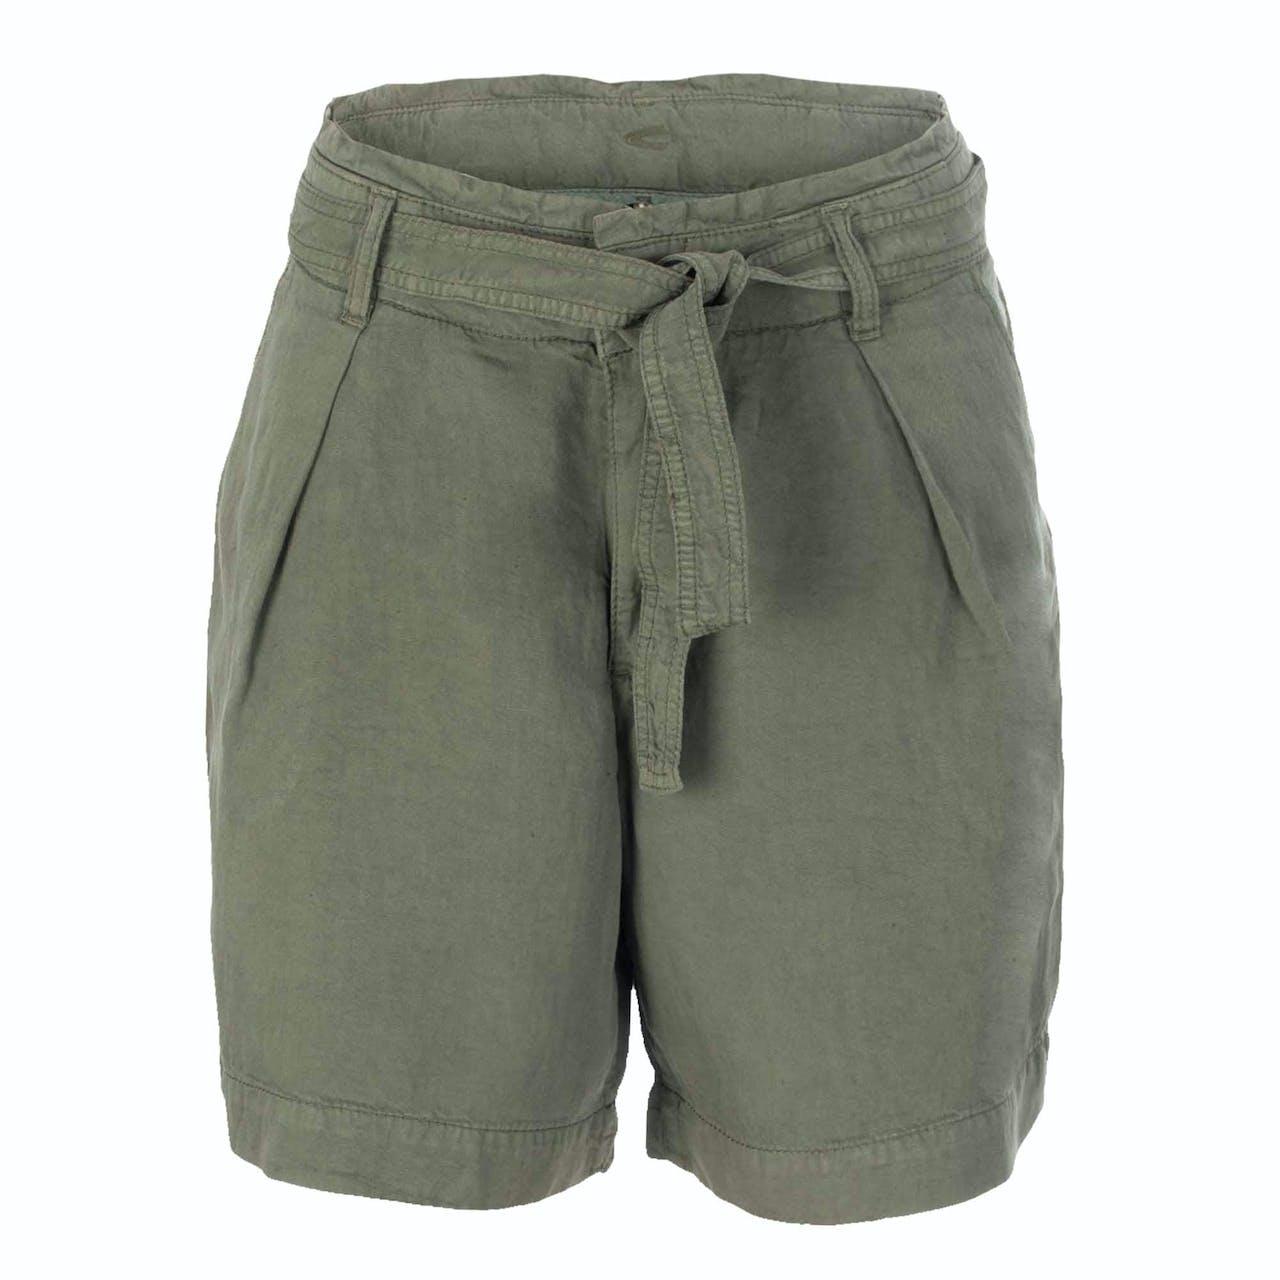 Shorts - Loose Fit - Leinen-Mix